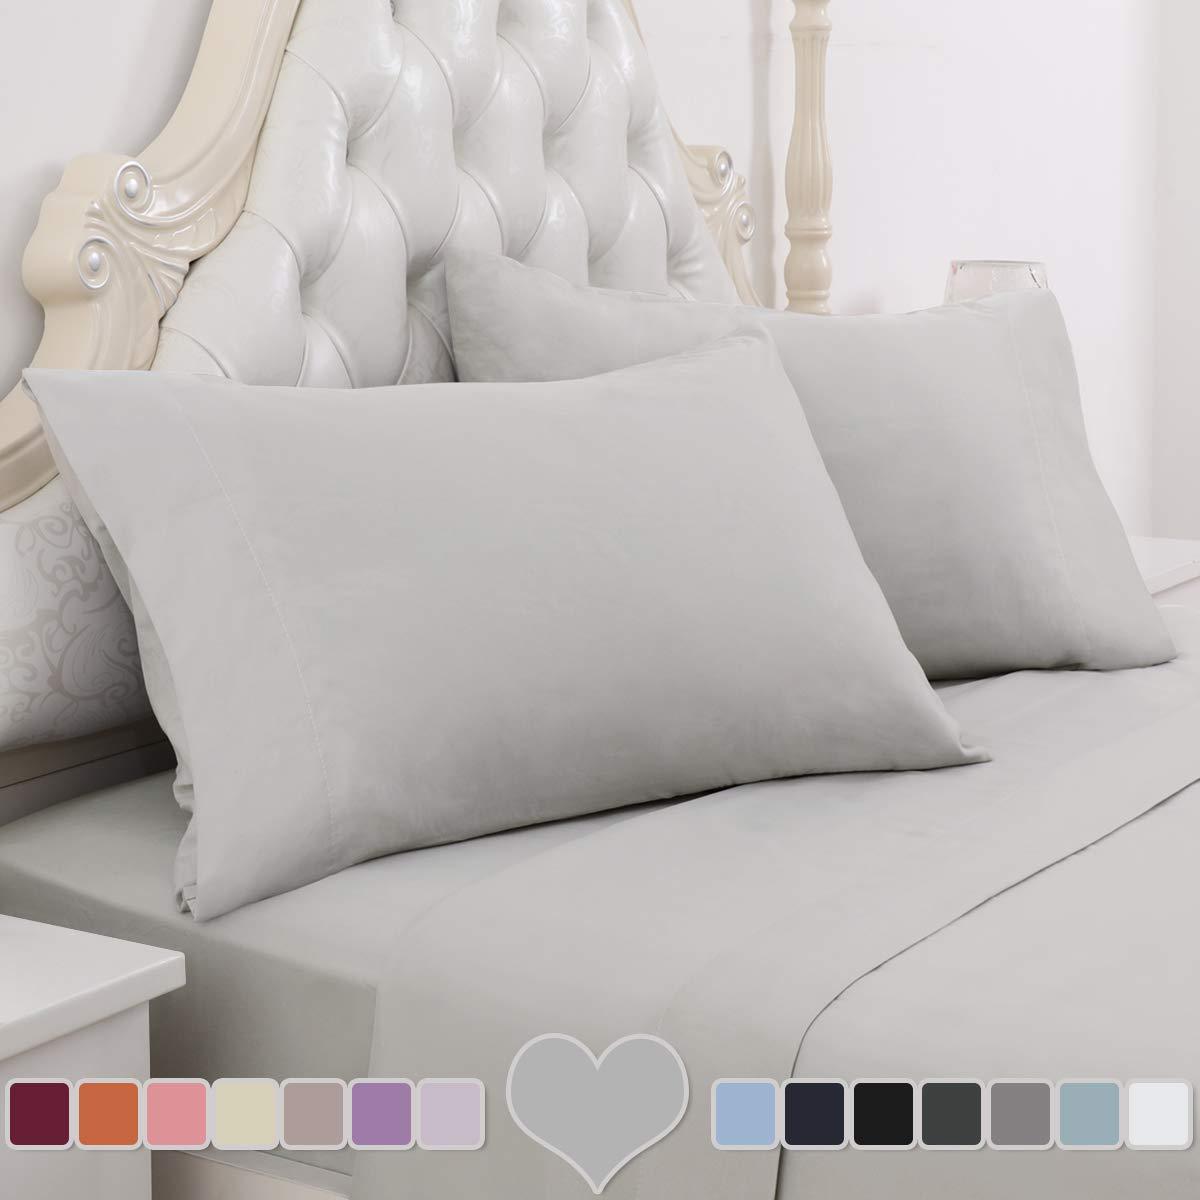 HOMEIDEAS 3 Piece Bed Sheet Set (Twin, Light Gray) 100% Brushed Microfiber 1800 Bedding Sheets - Deep Pockets